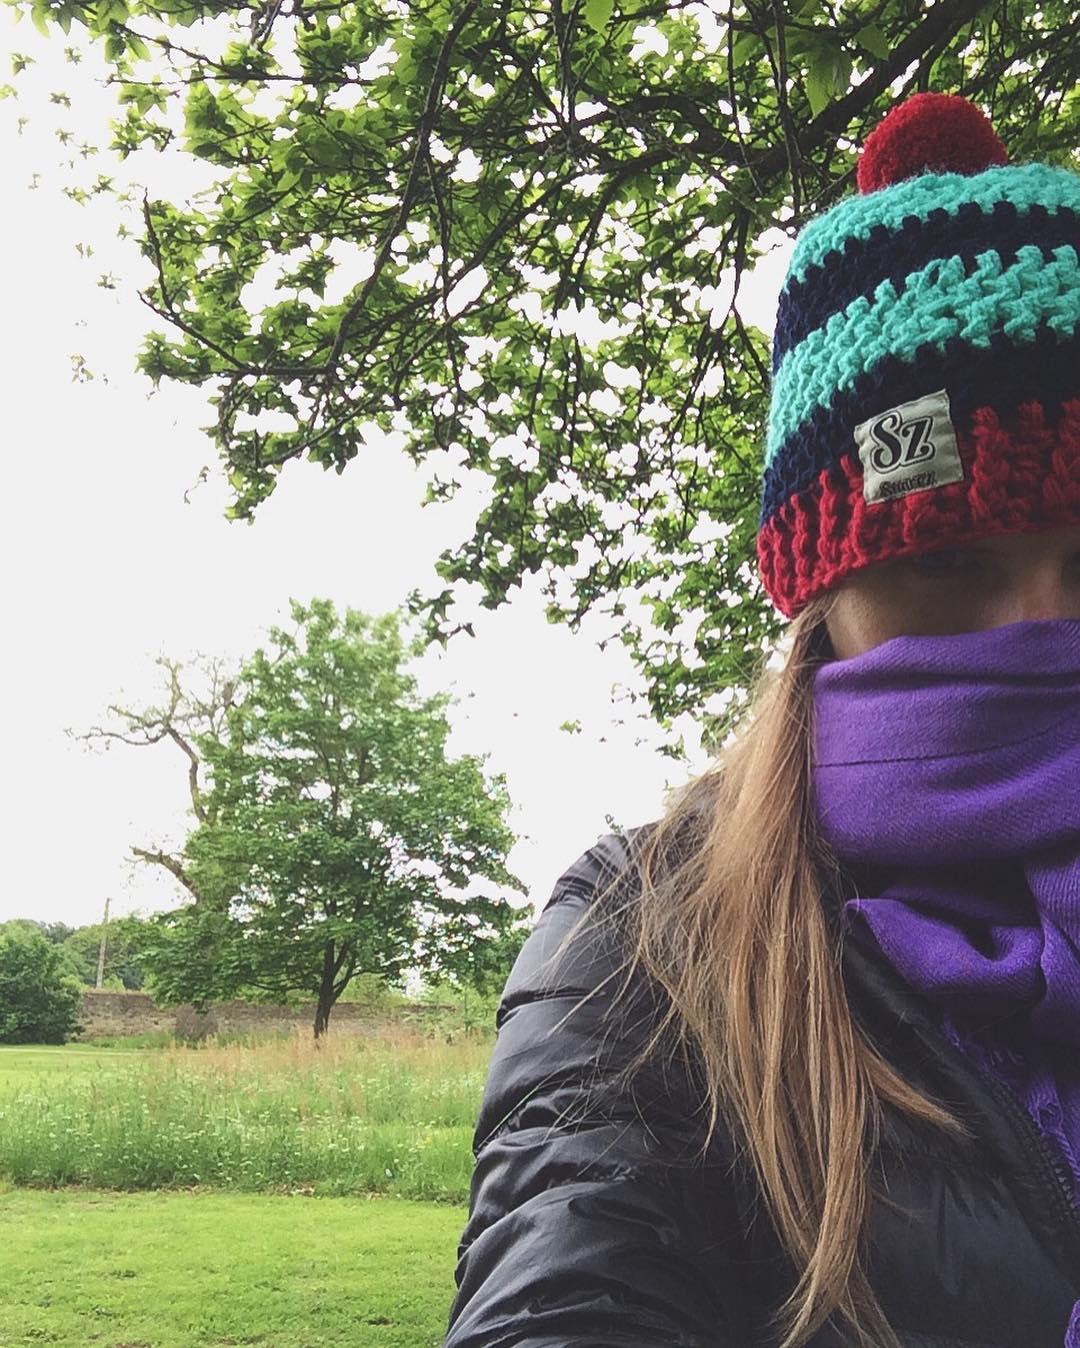 Arrancar el día con frío pero saber que estás cubierta #GorrosConOnda #UsáSuarez